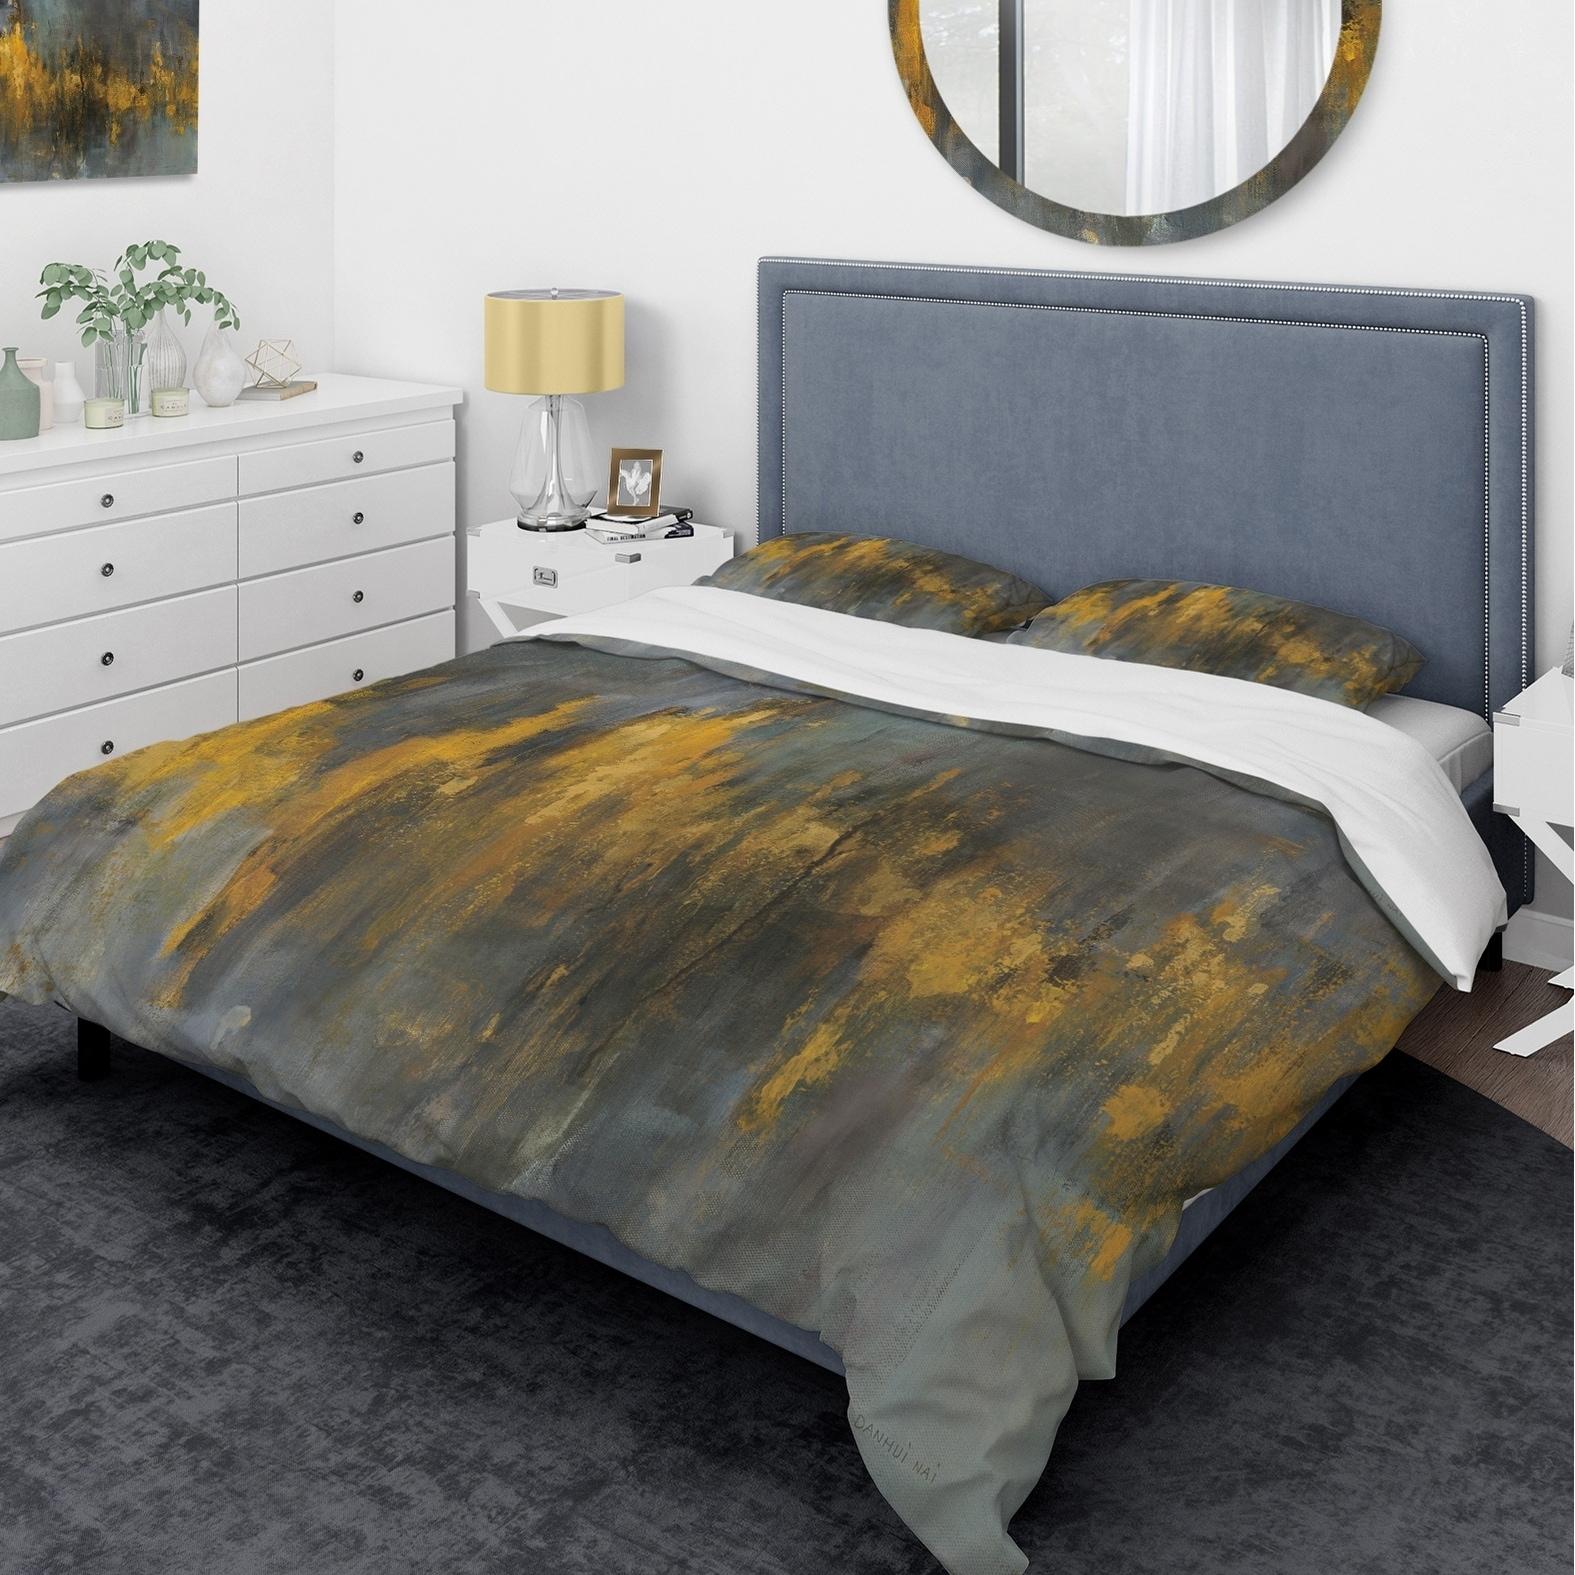 DESIGN ART Designart 'Black and Gold Glam Abstract' Glam Bedding Set - Duvet Cover & Shams